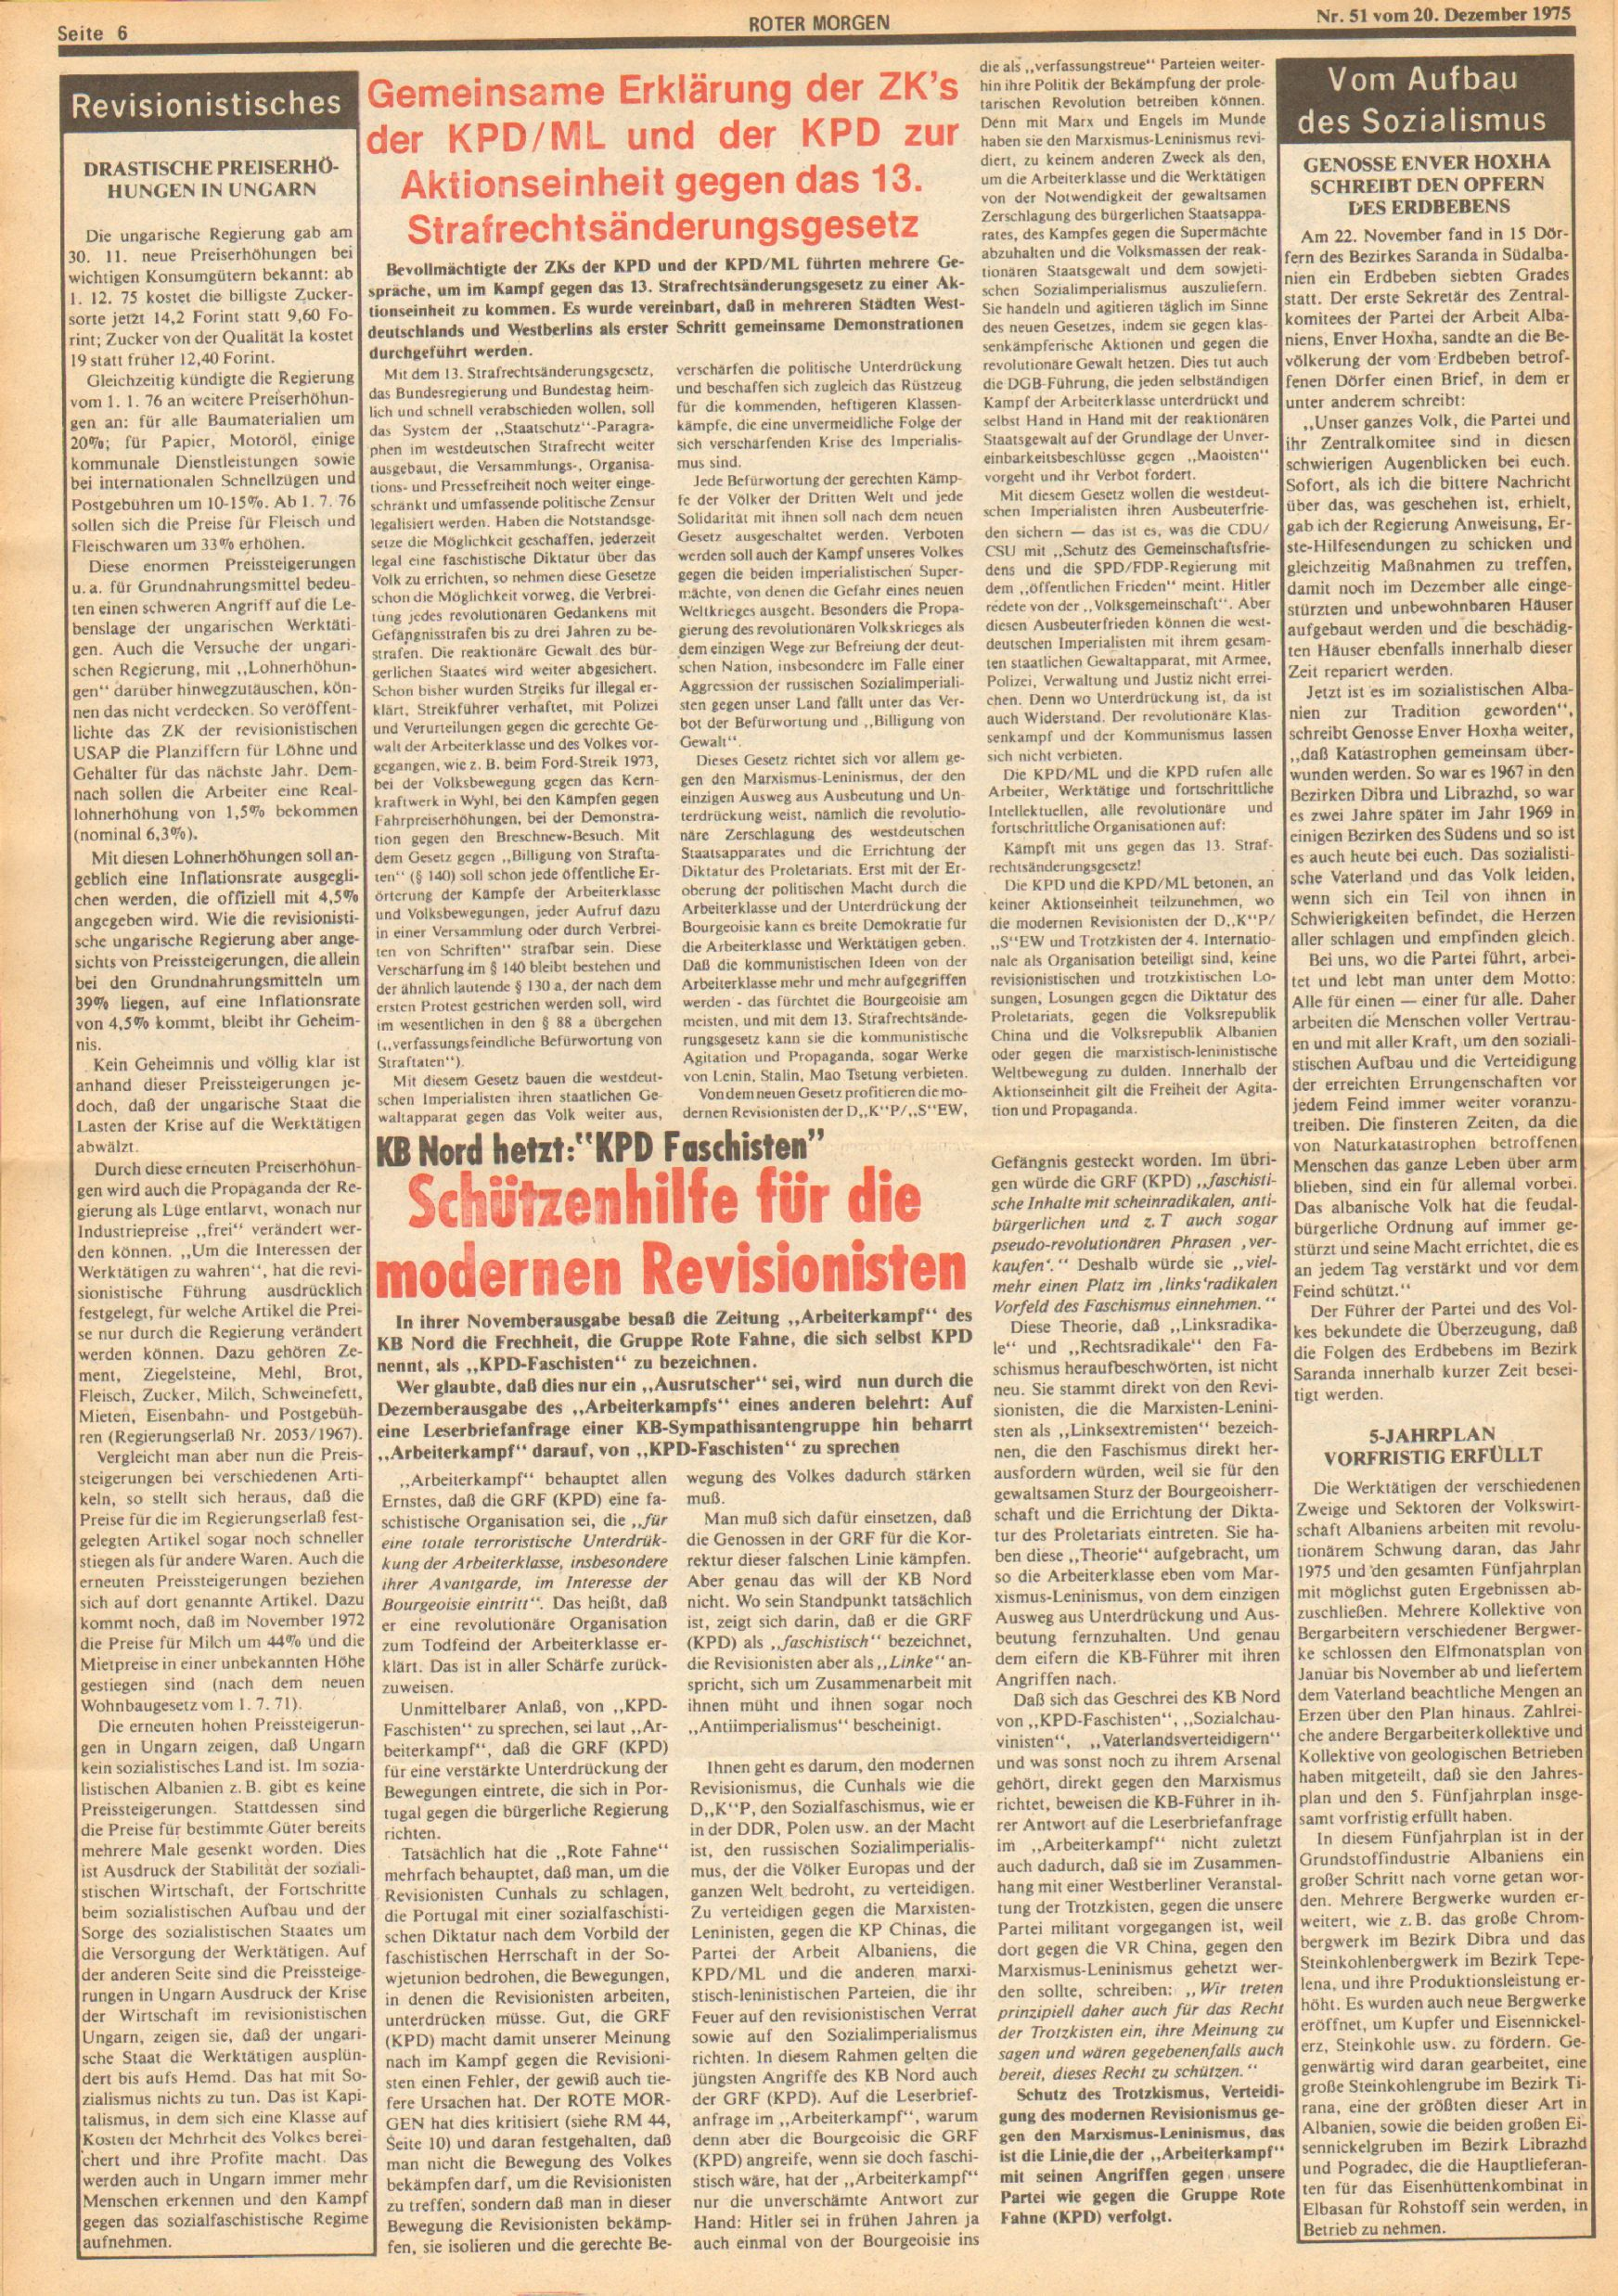 Roter Morgen, 9. Jg., 20. Dezember 1975, Nr. 51, Seite 6